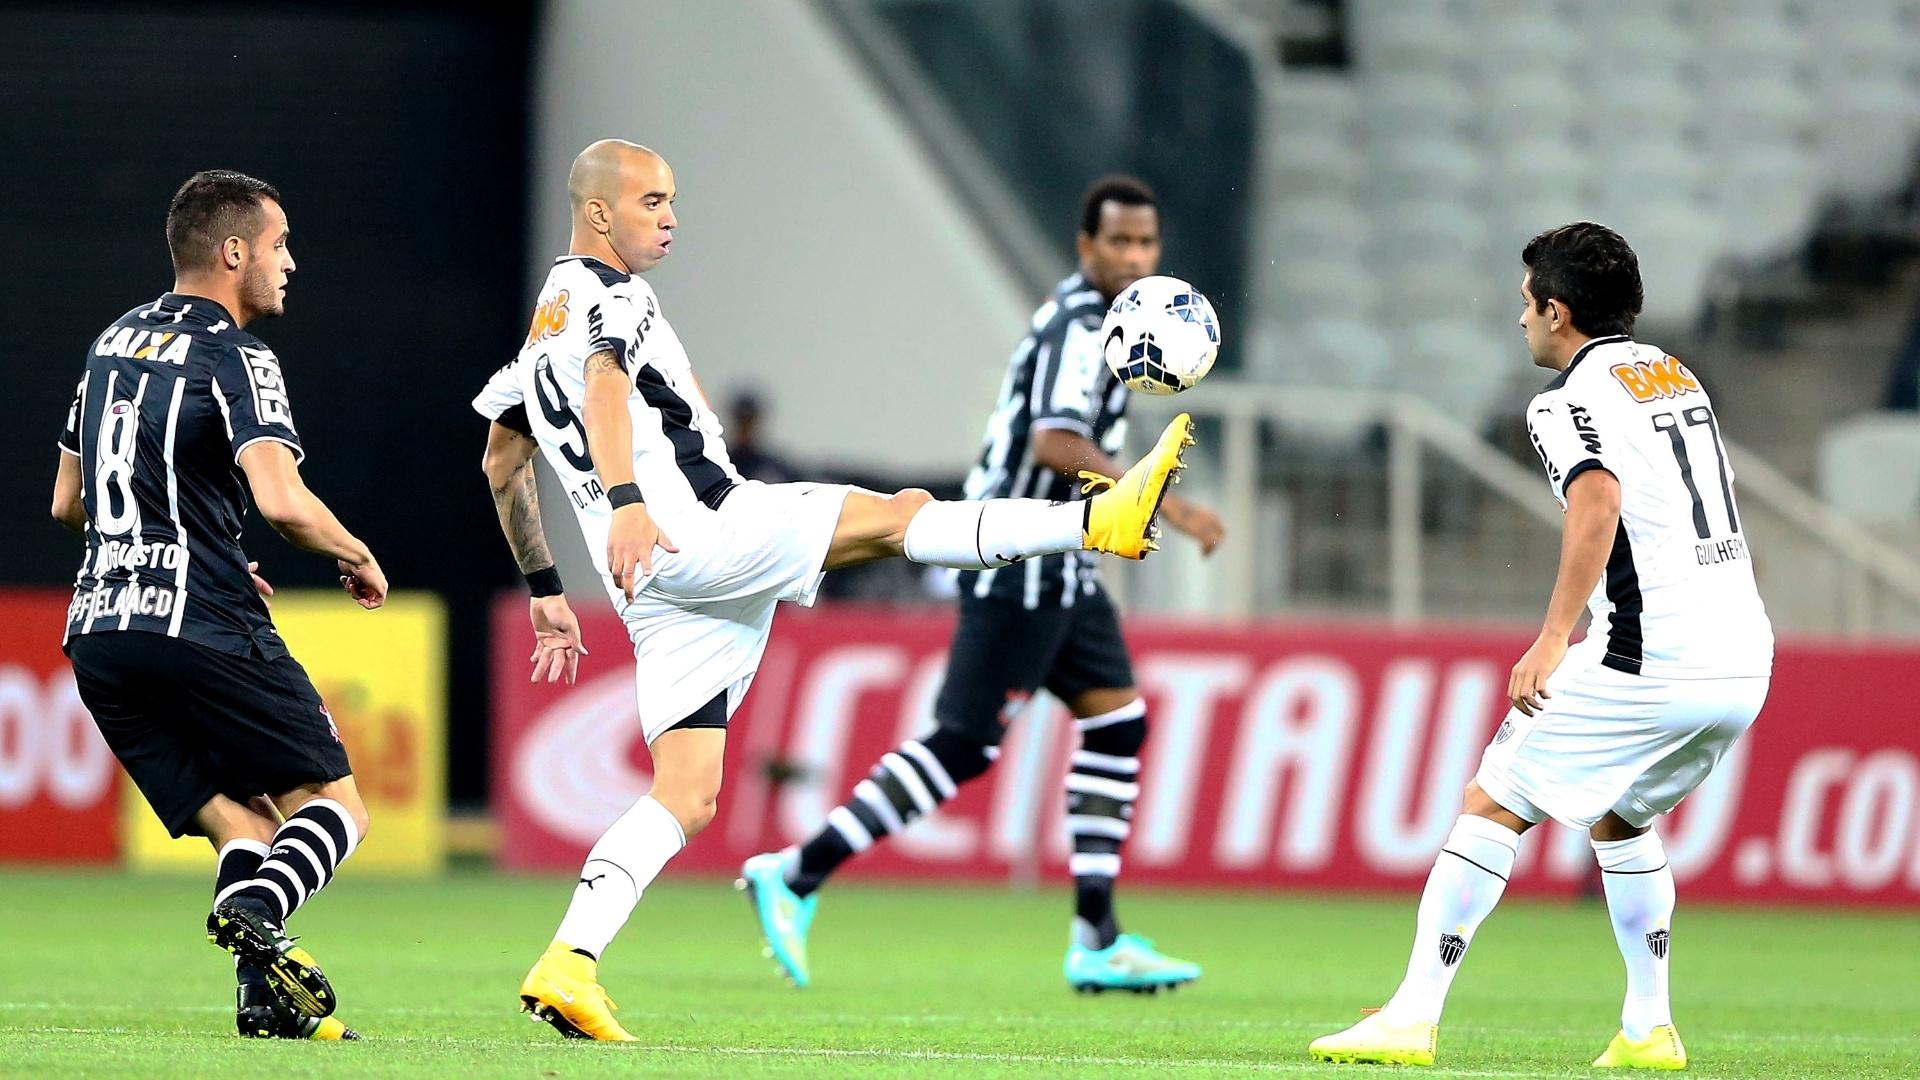 Diego Tardelli, do Atlético-MG, tenta dominar a bola contra o Corinthians